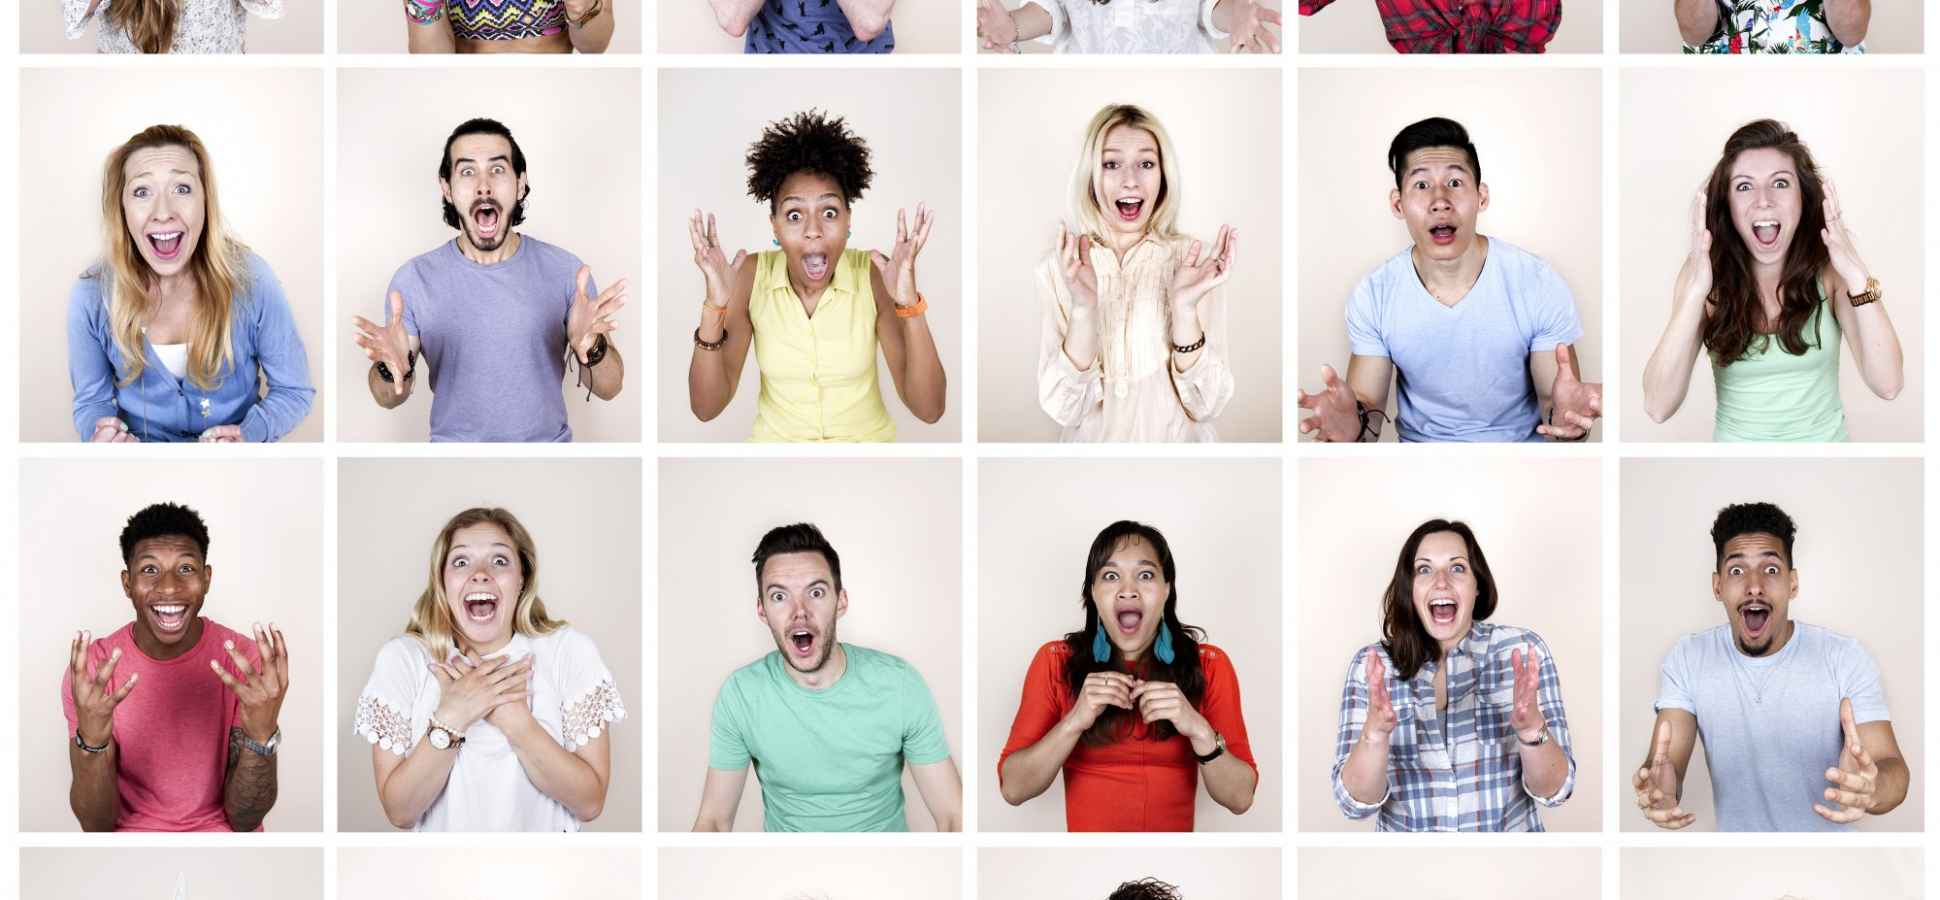 8 Ways to Read Someone's Body Language | Inc com